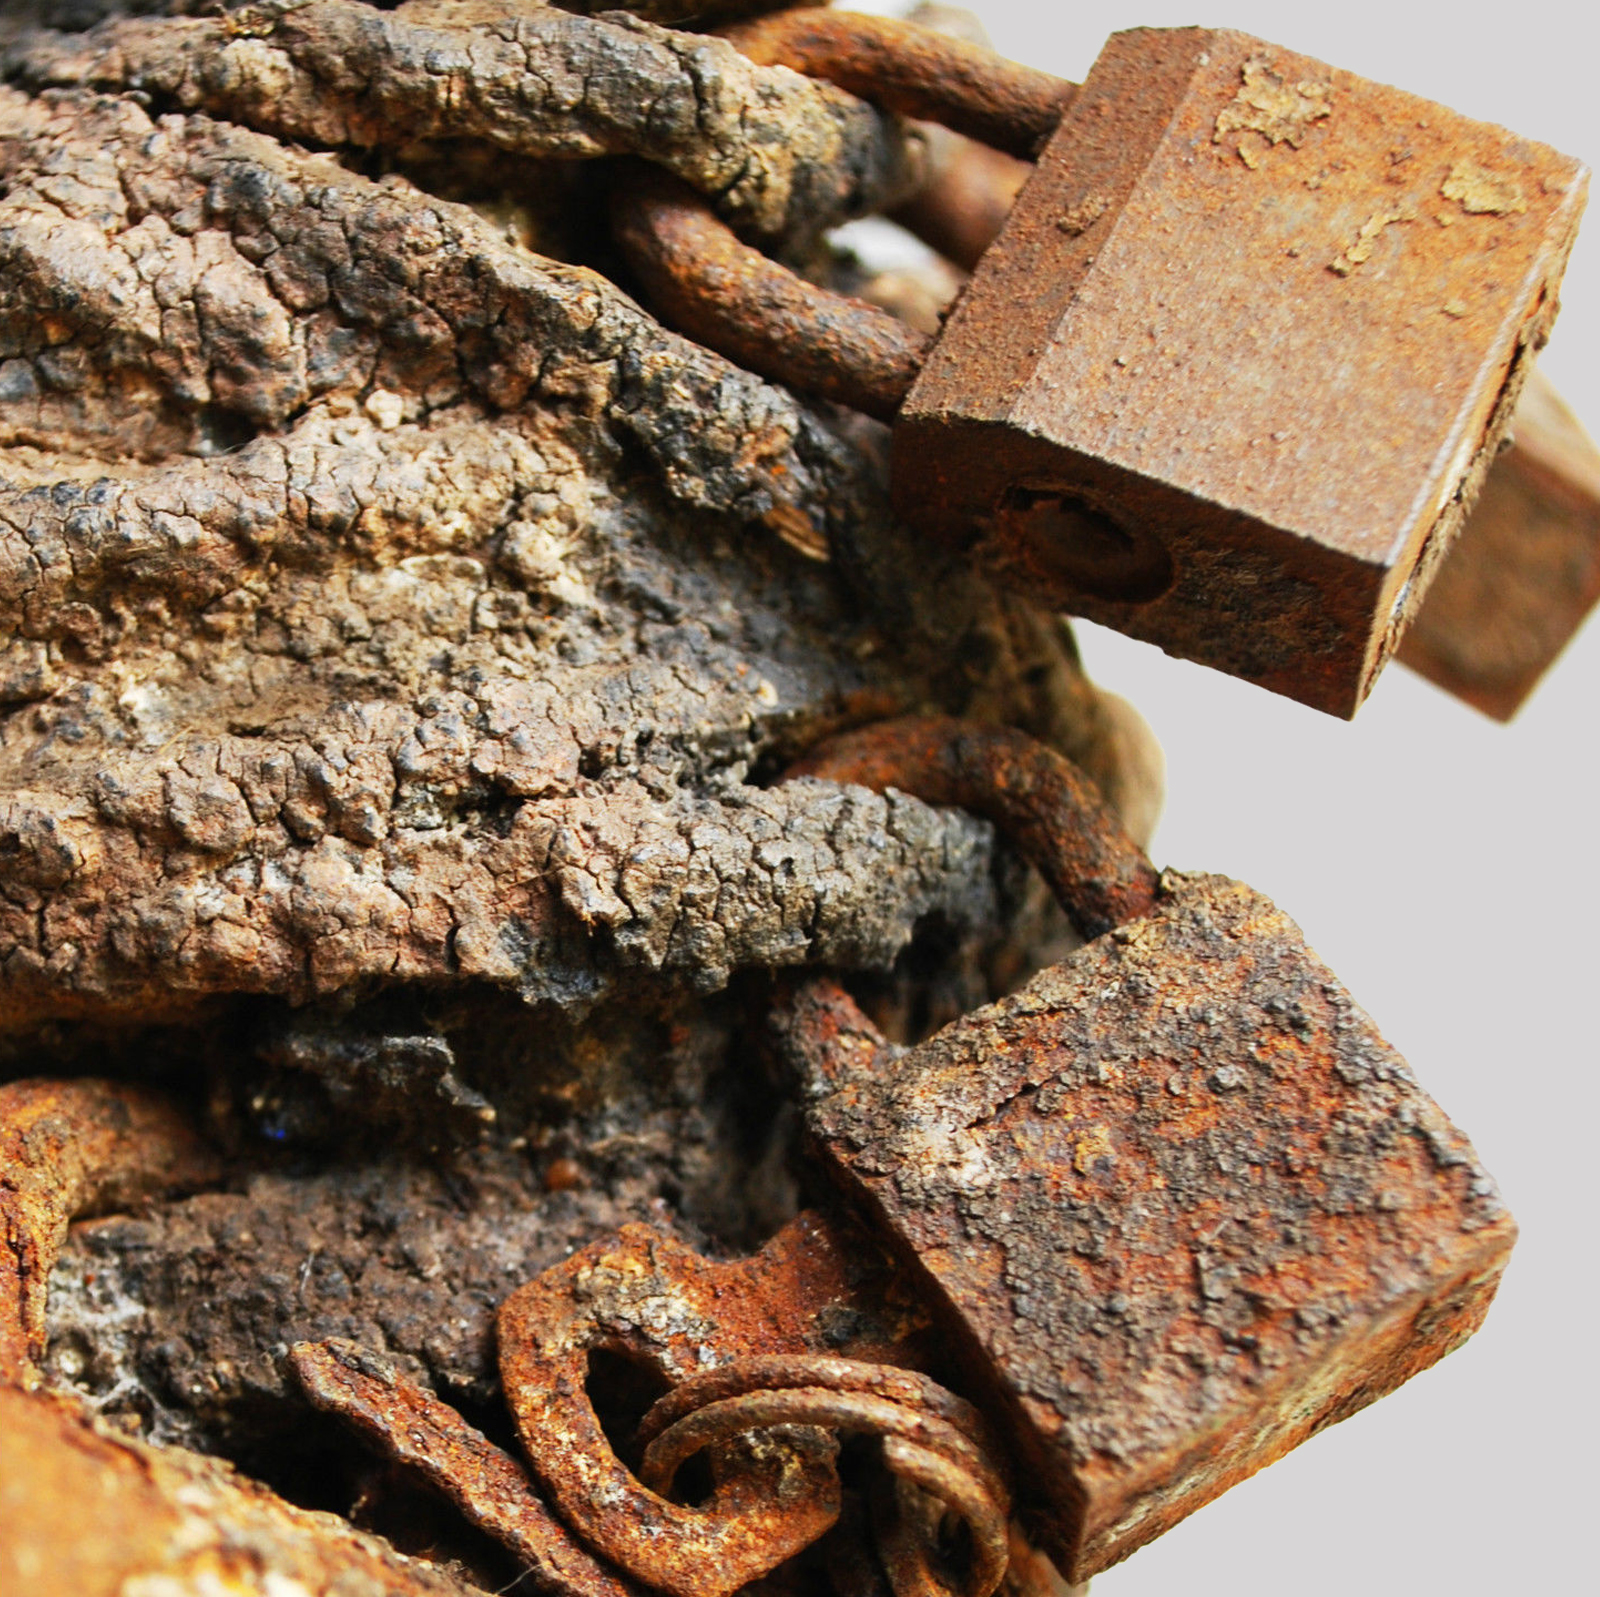 rust2.jpg